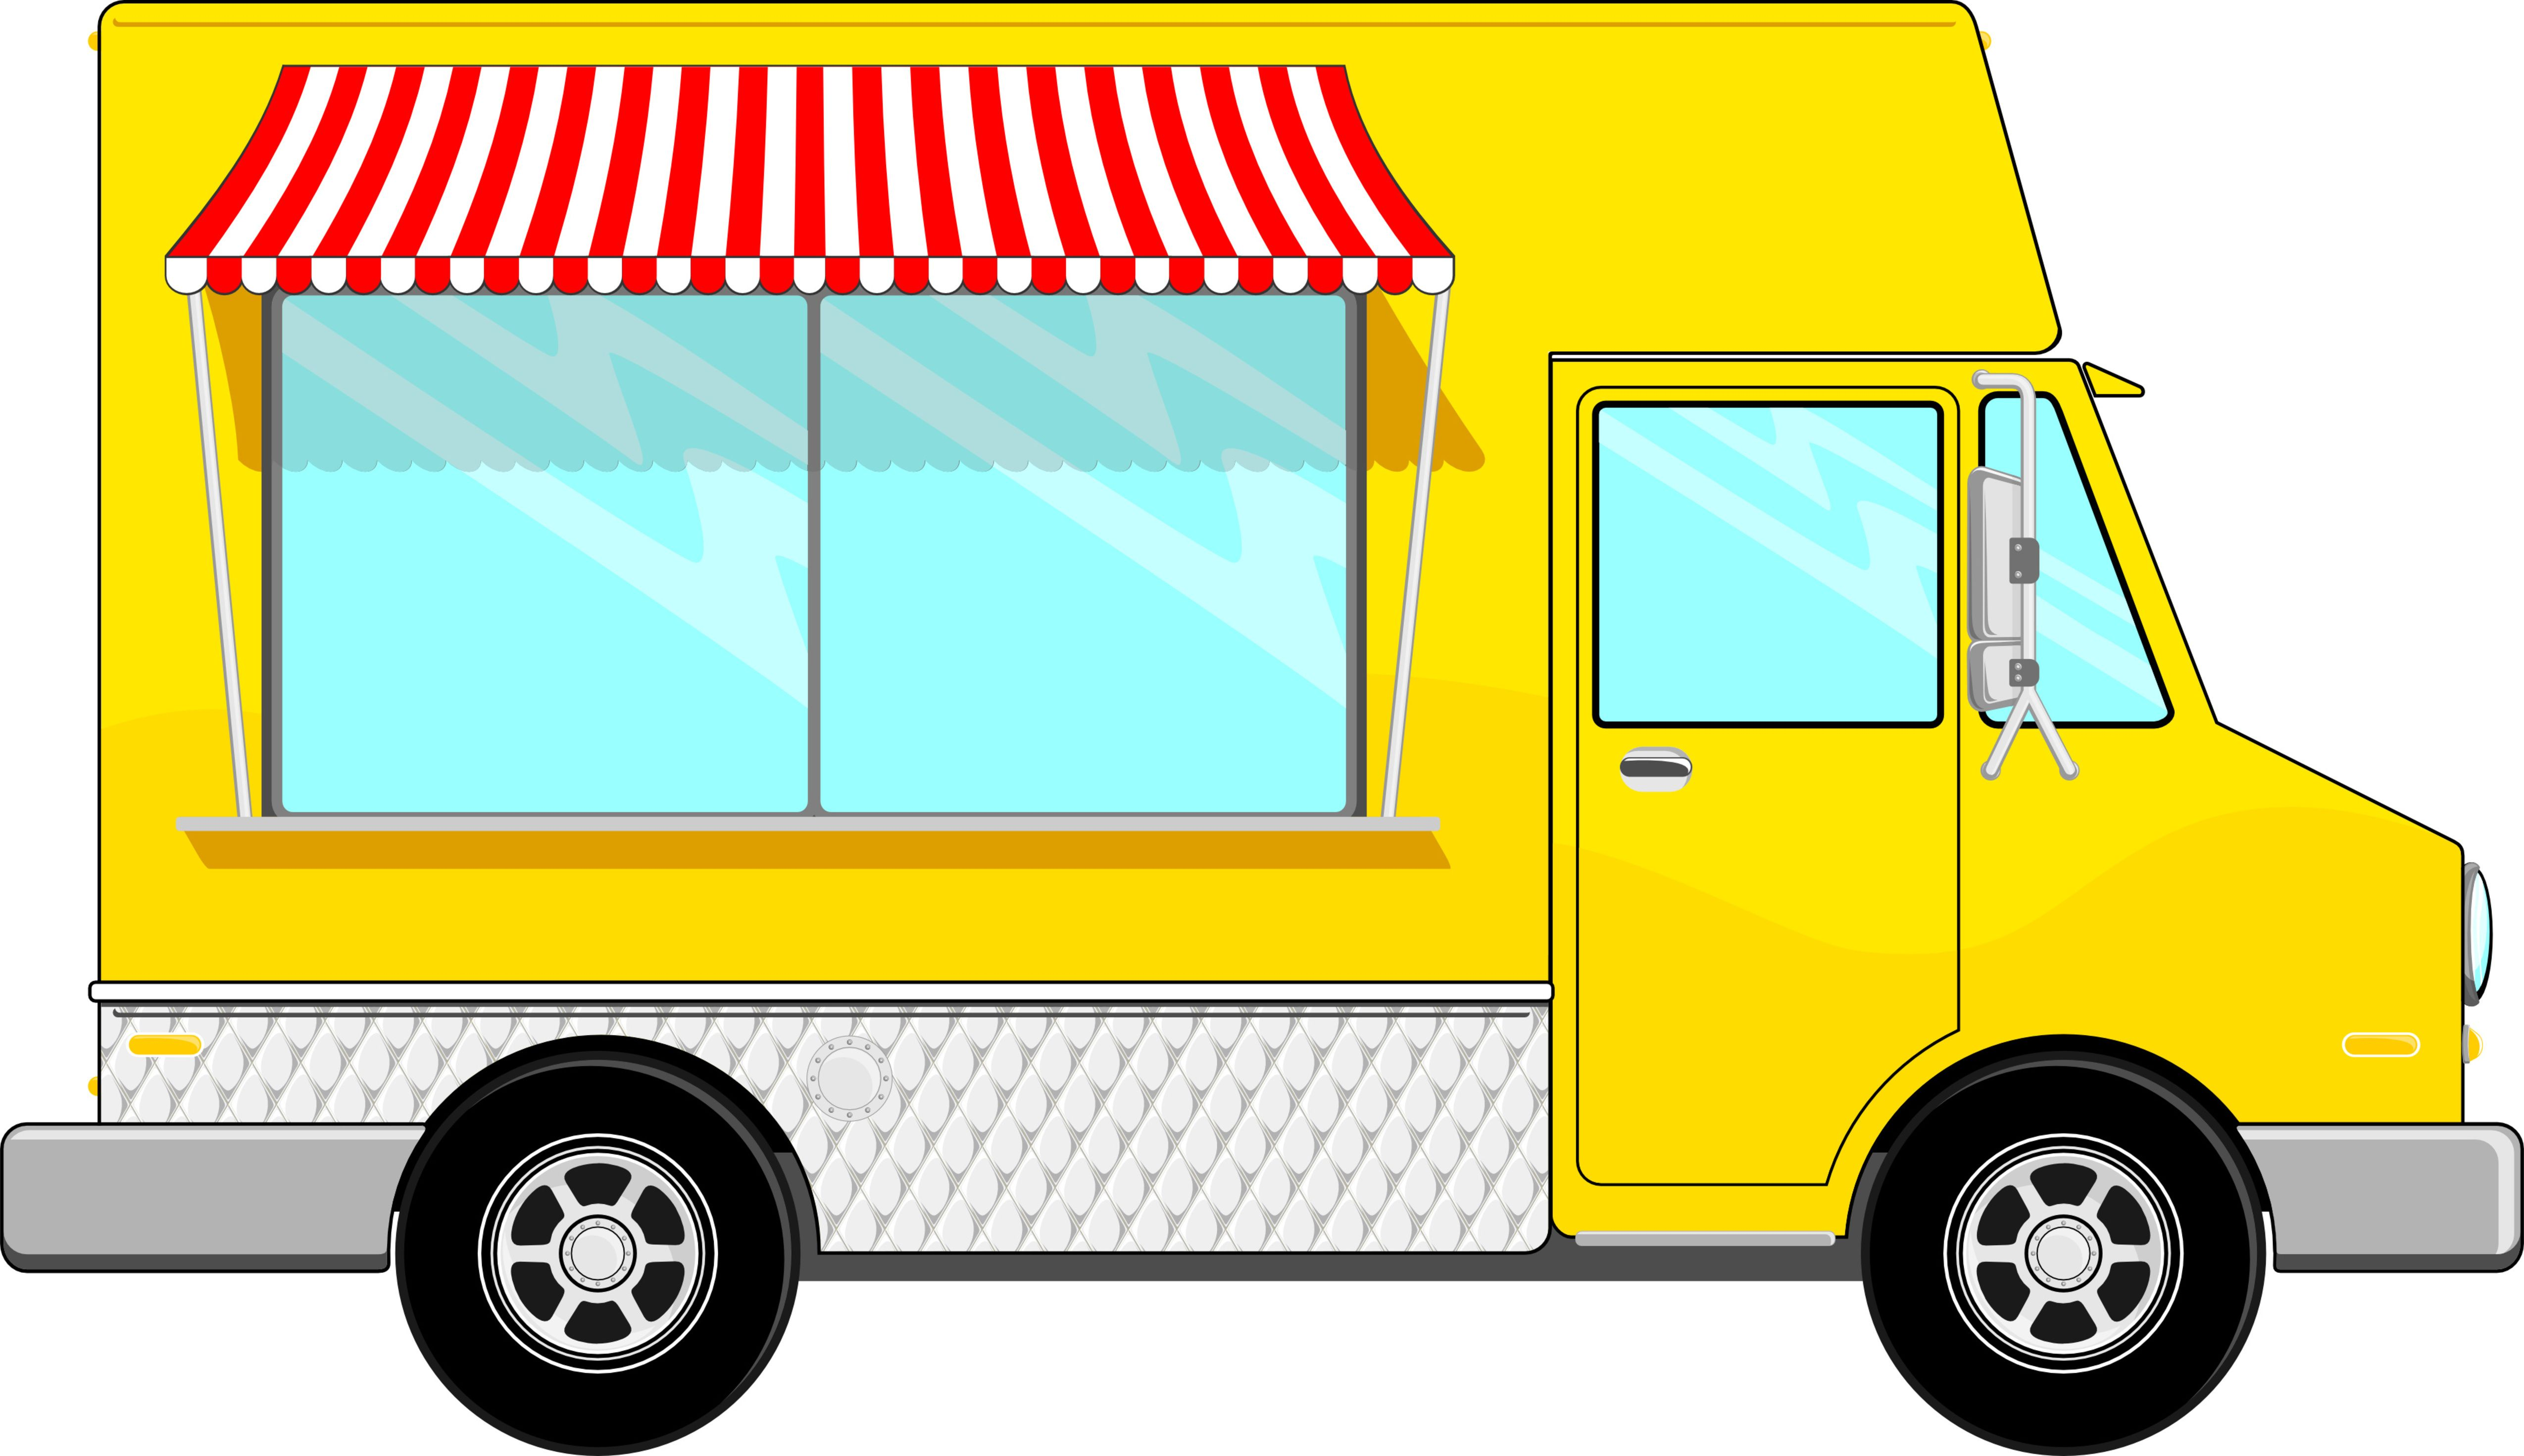 Image result for food truck.